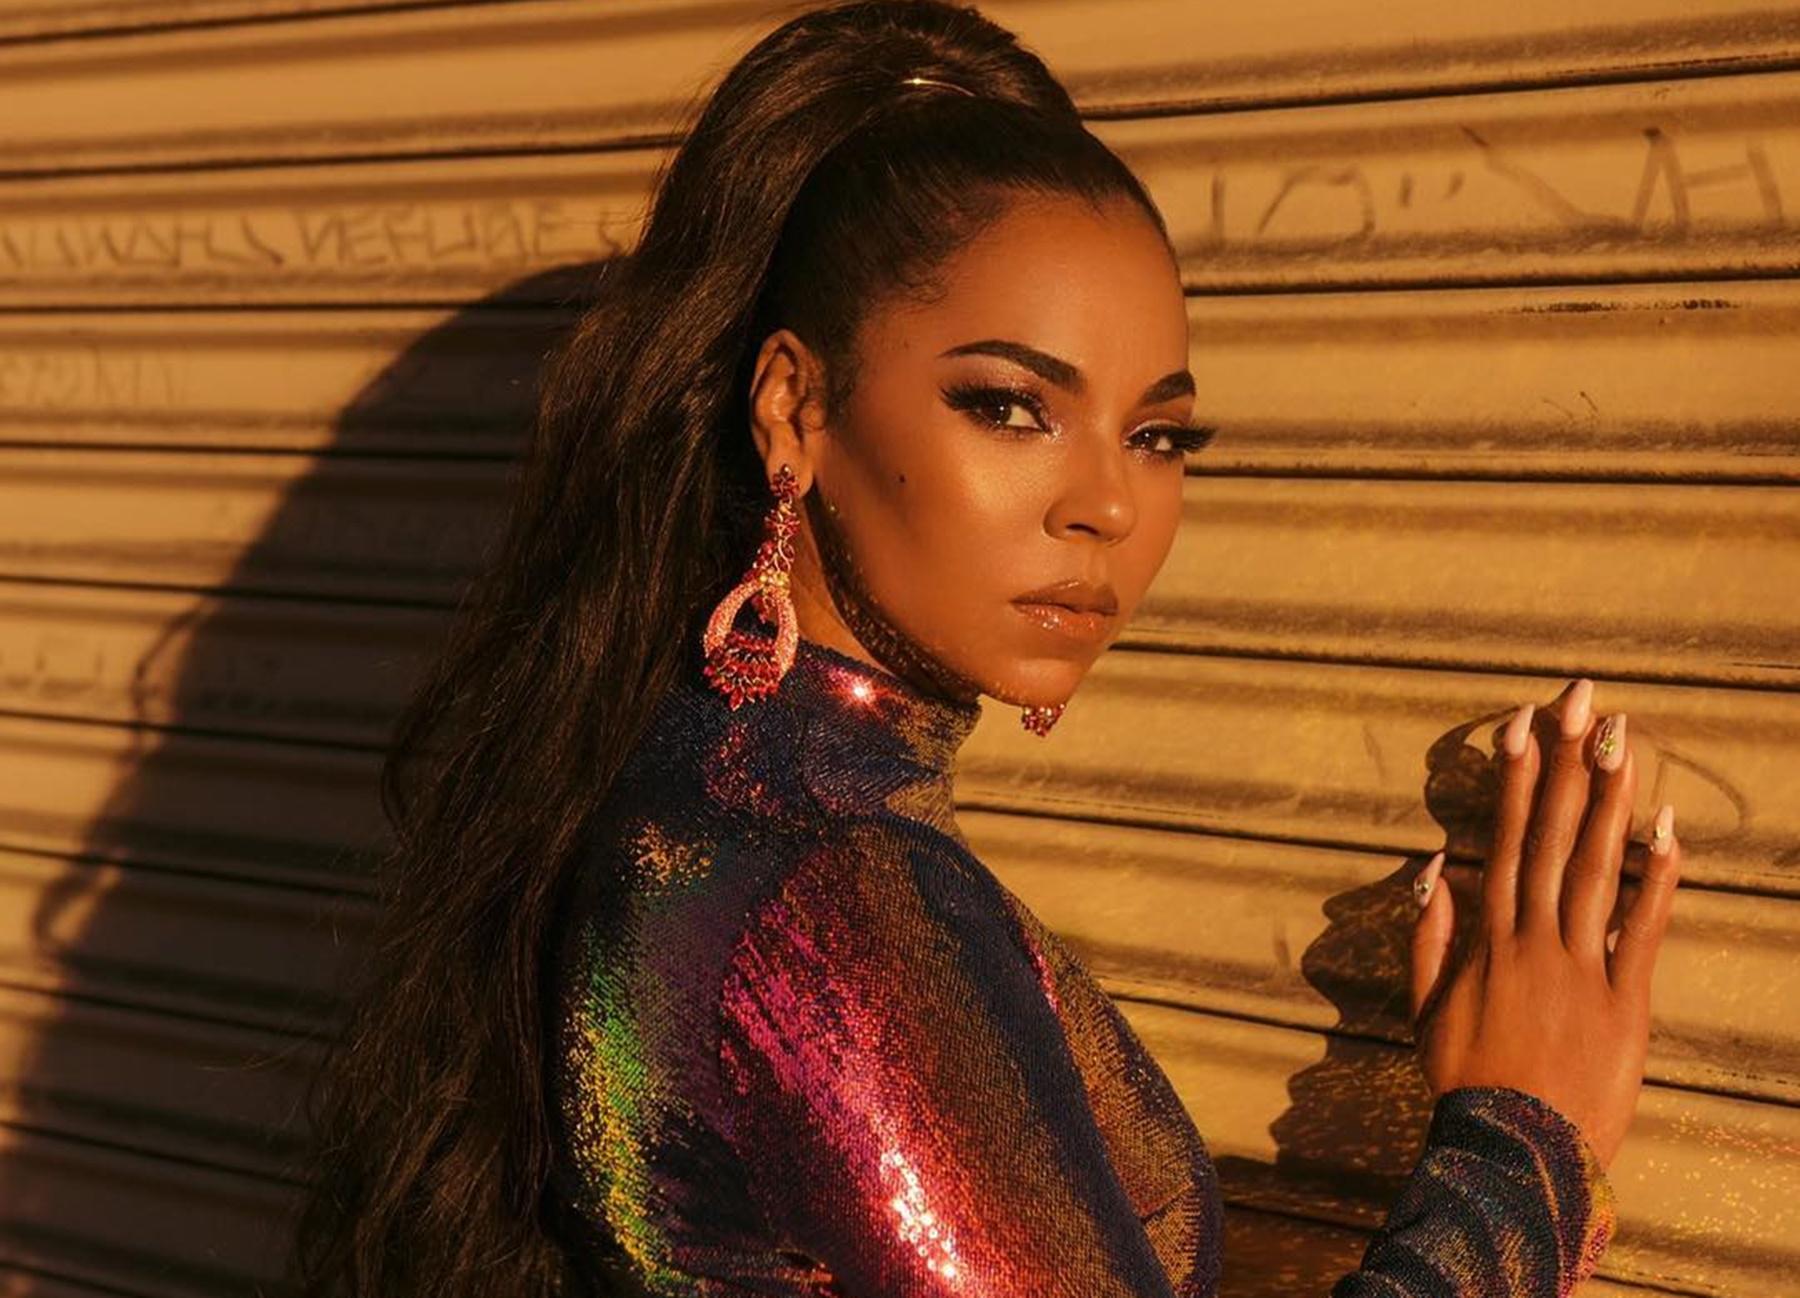 Ashanti Janet Jackson Unrecognizable New Style